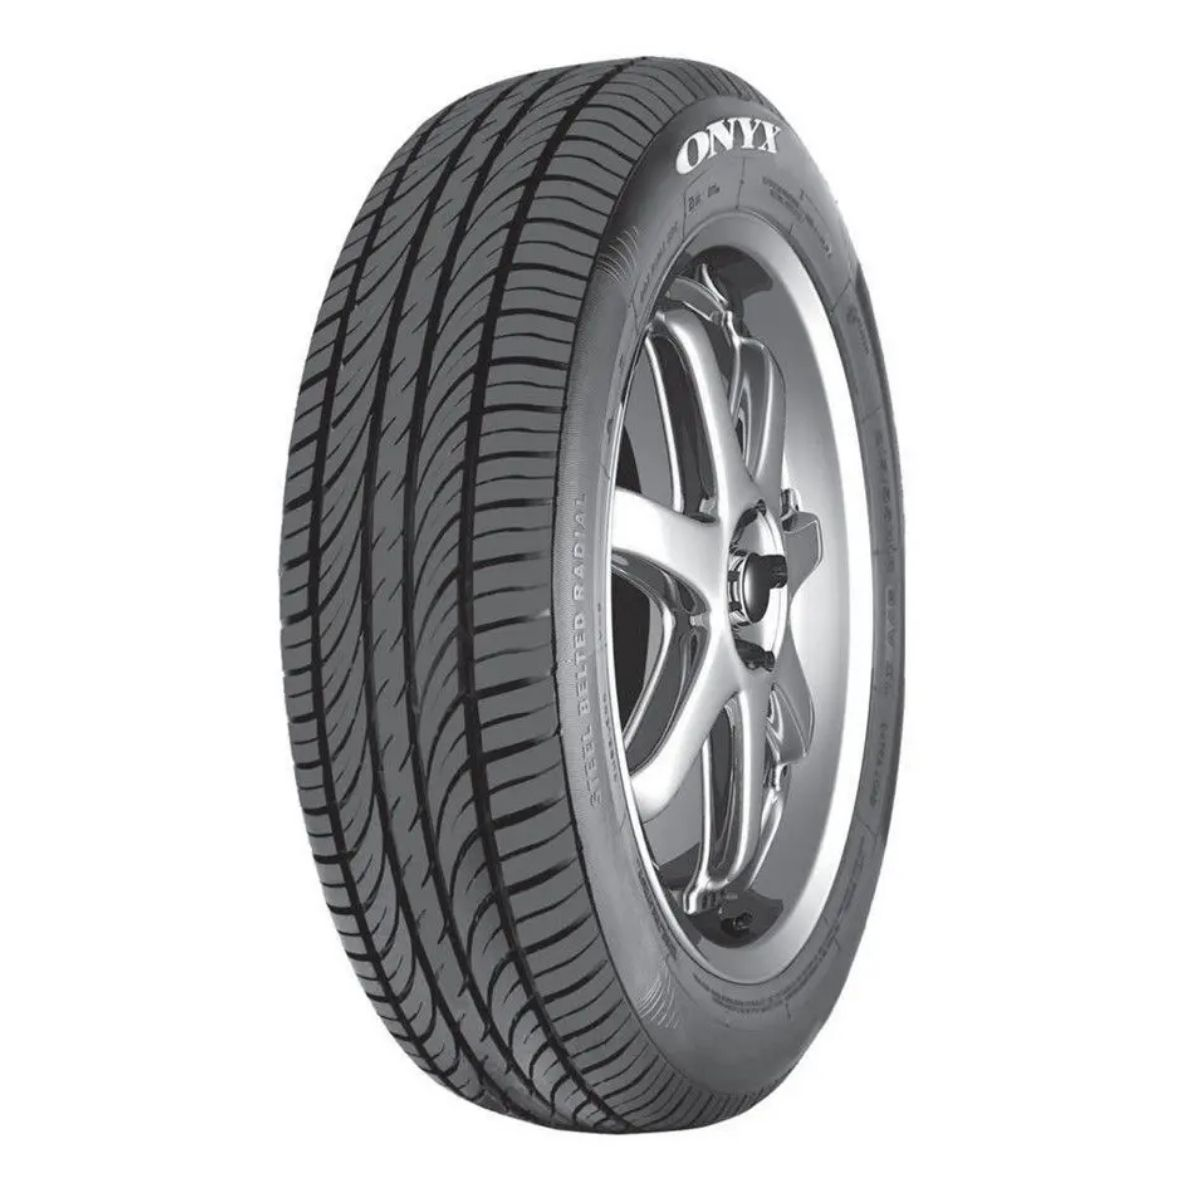 Pneu Onyx NY-801 Aro 15 185/65R15 88H